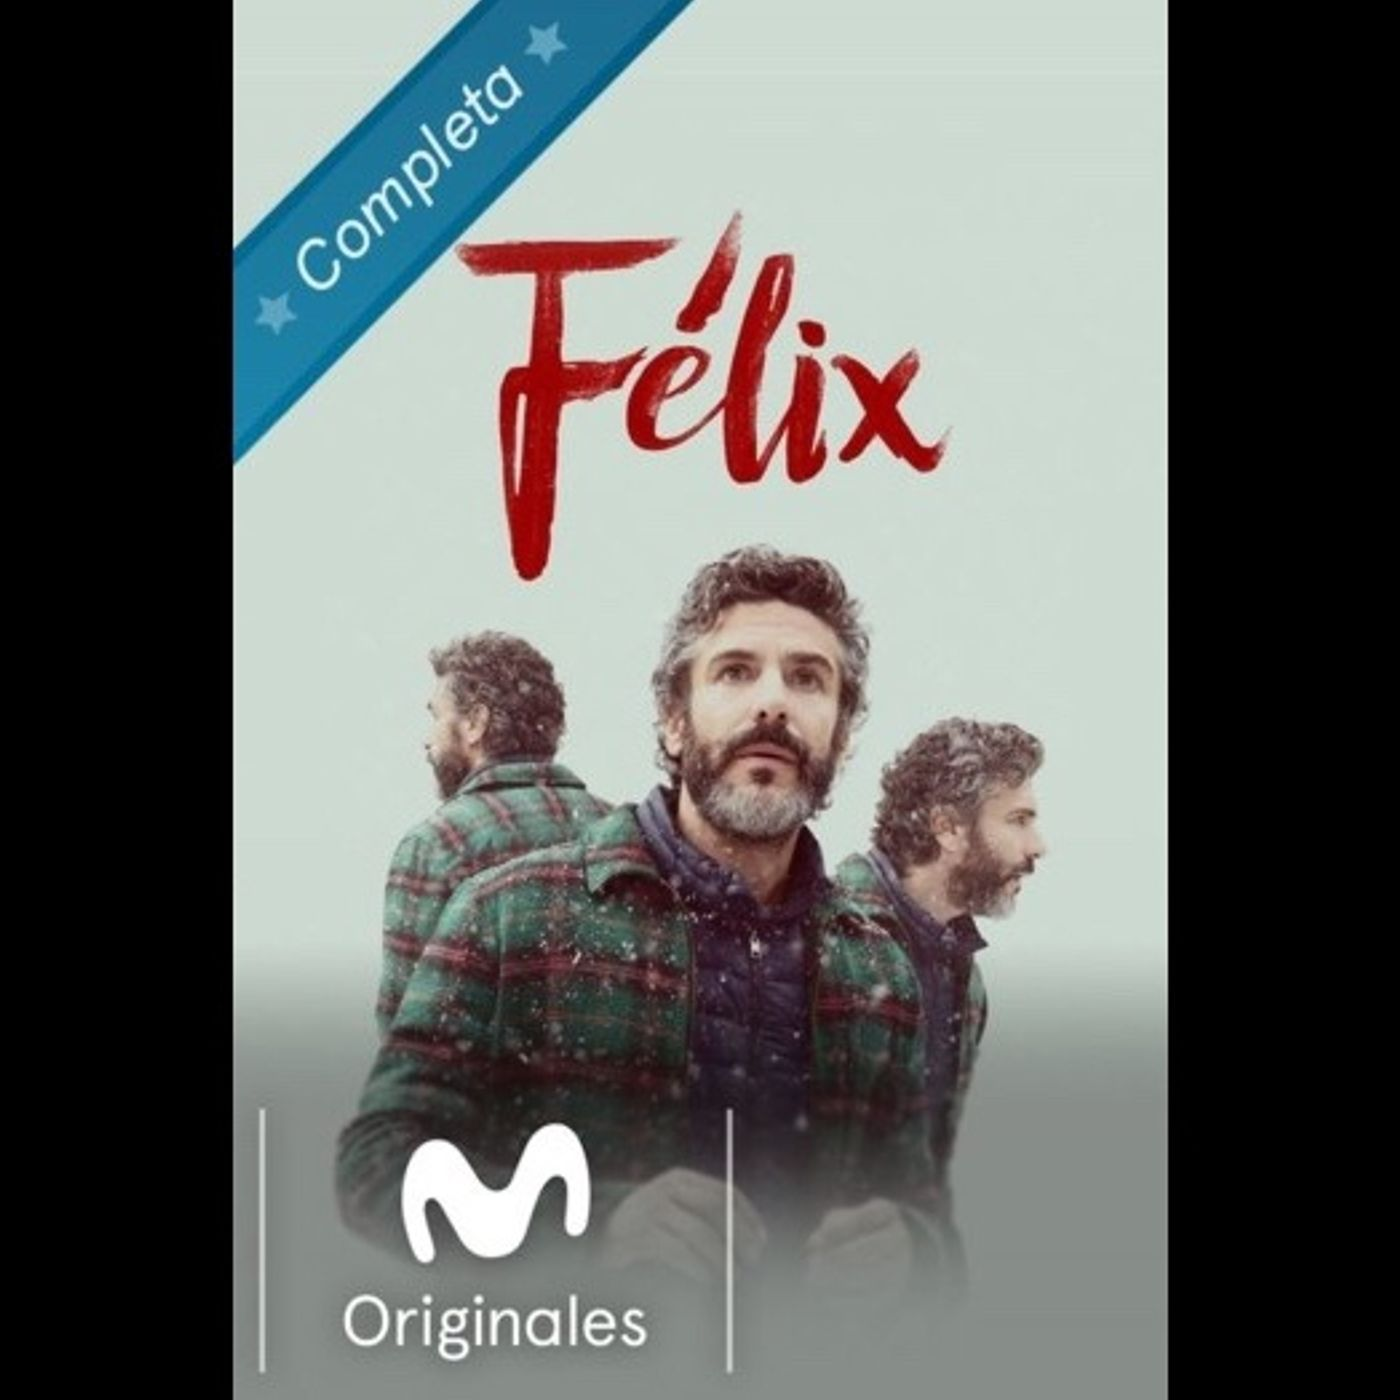 Ver Félix en Movistar Play